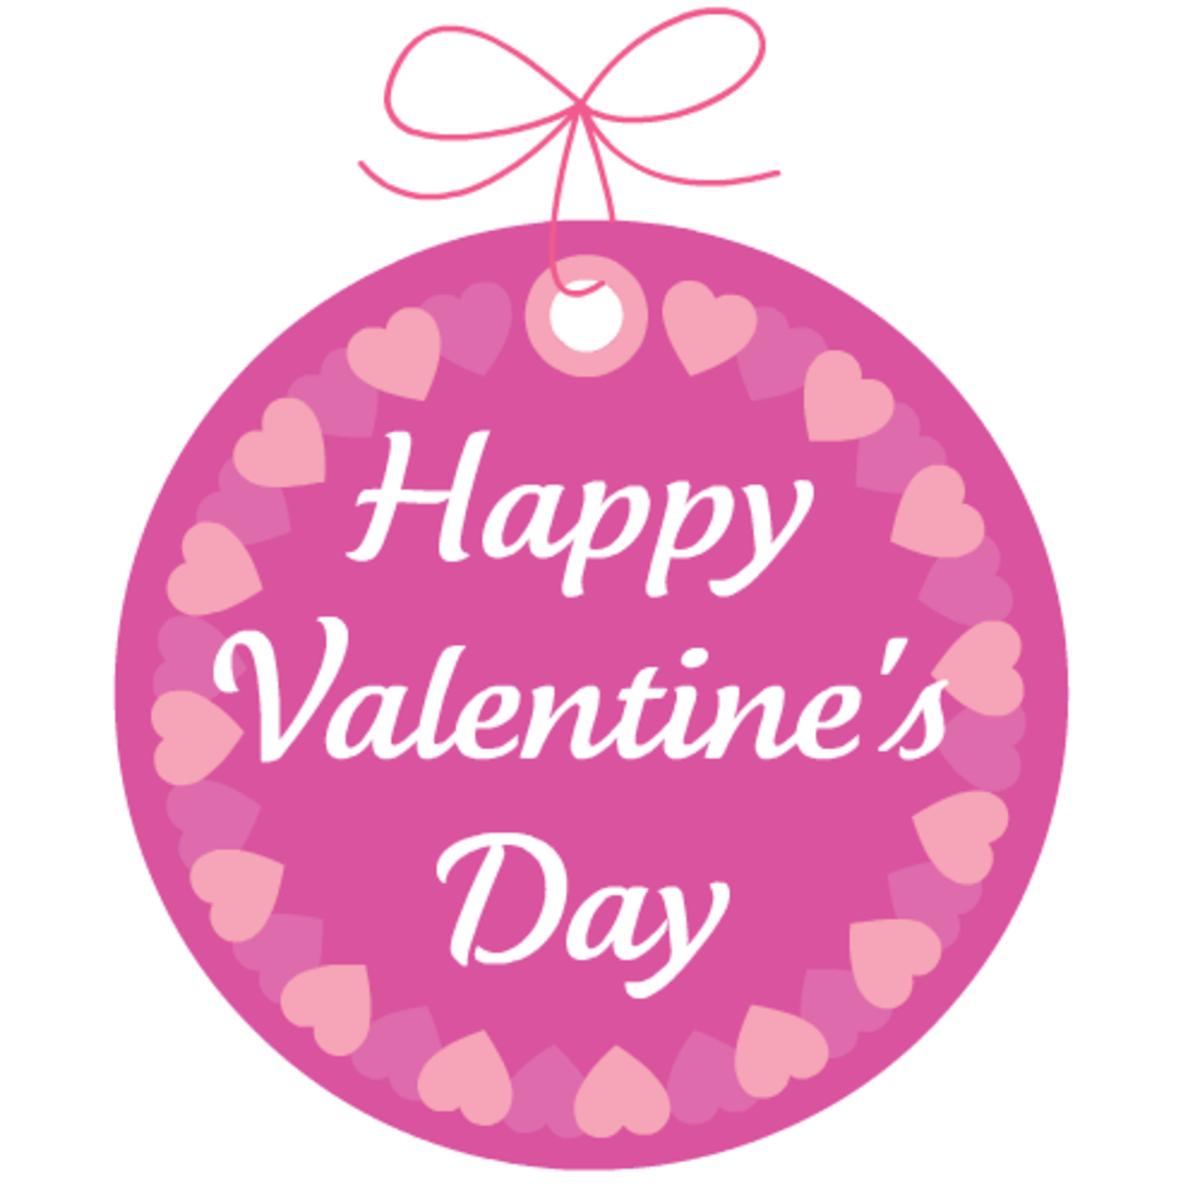 Valentine tags: Happy Valentine's Day